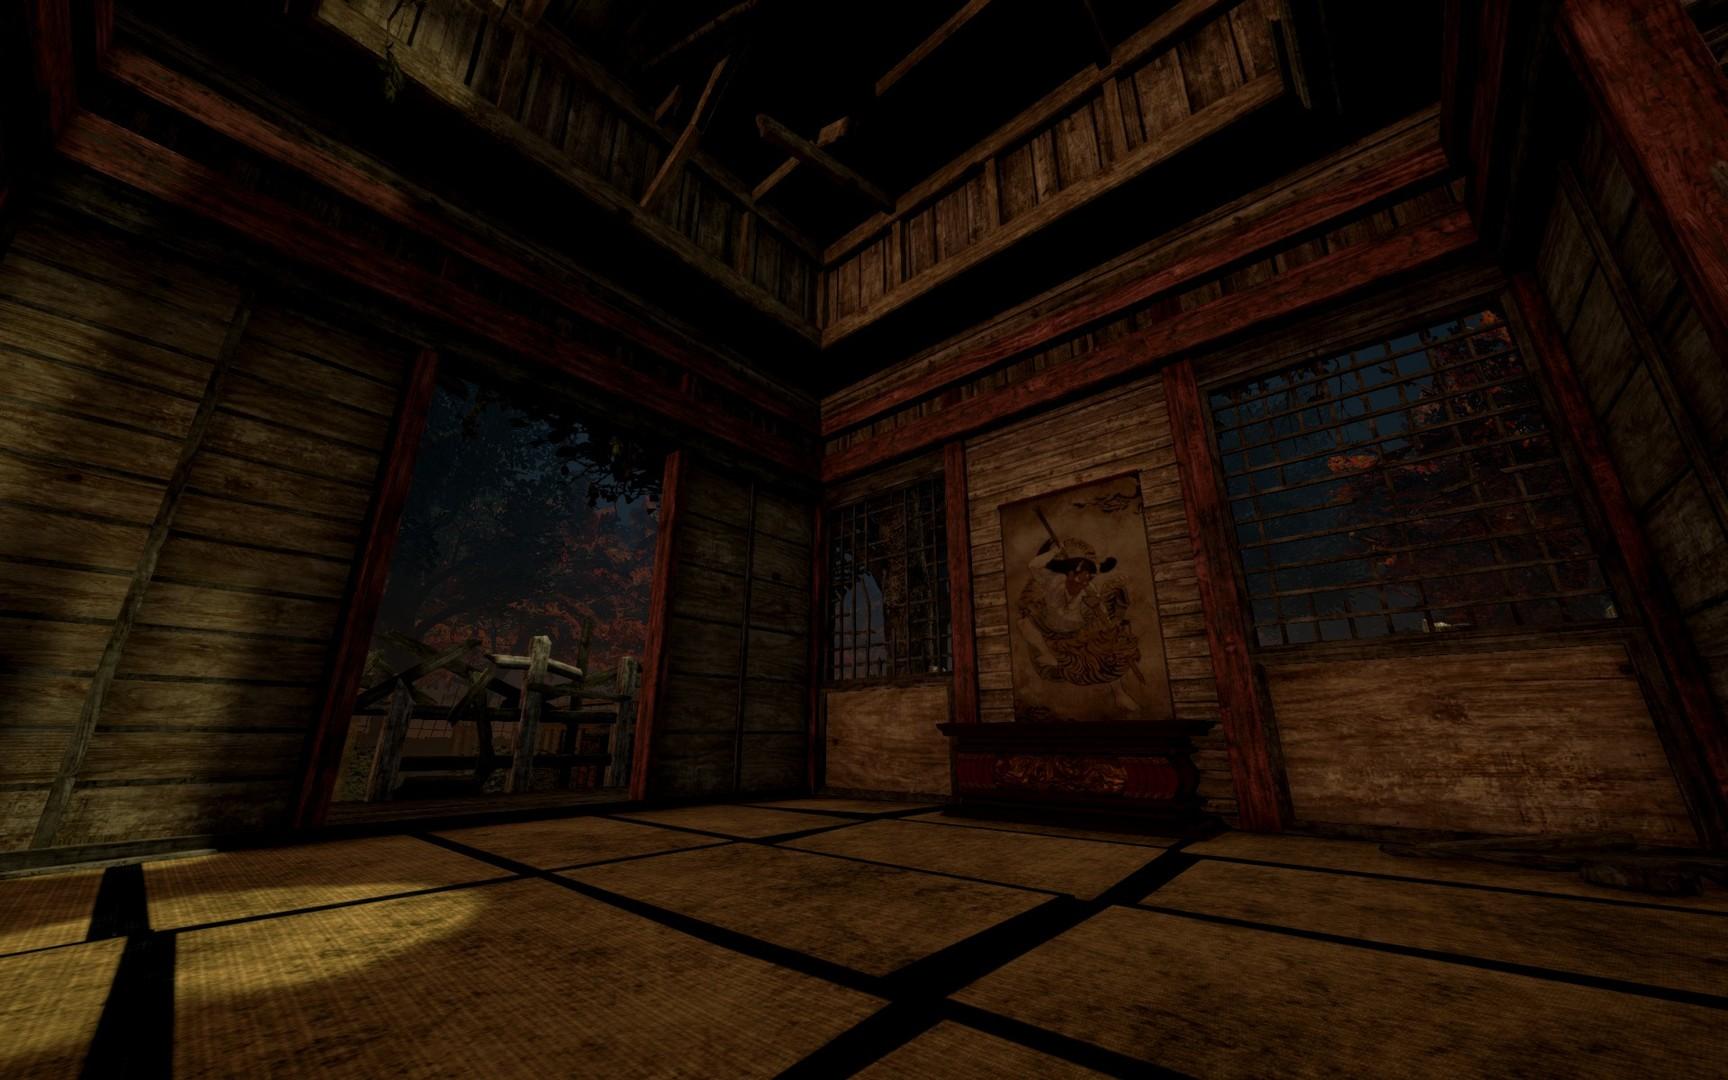 KHAiHOM.com - Dead by Daylight - Shattered Bloodline Chapter